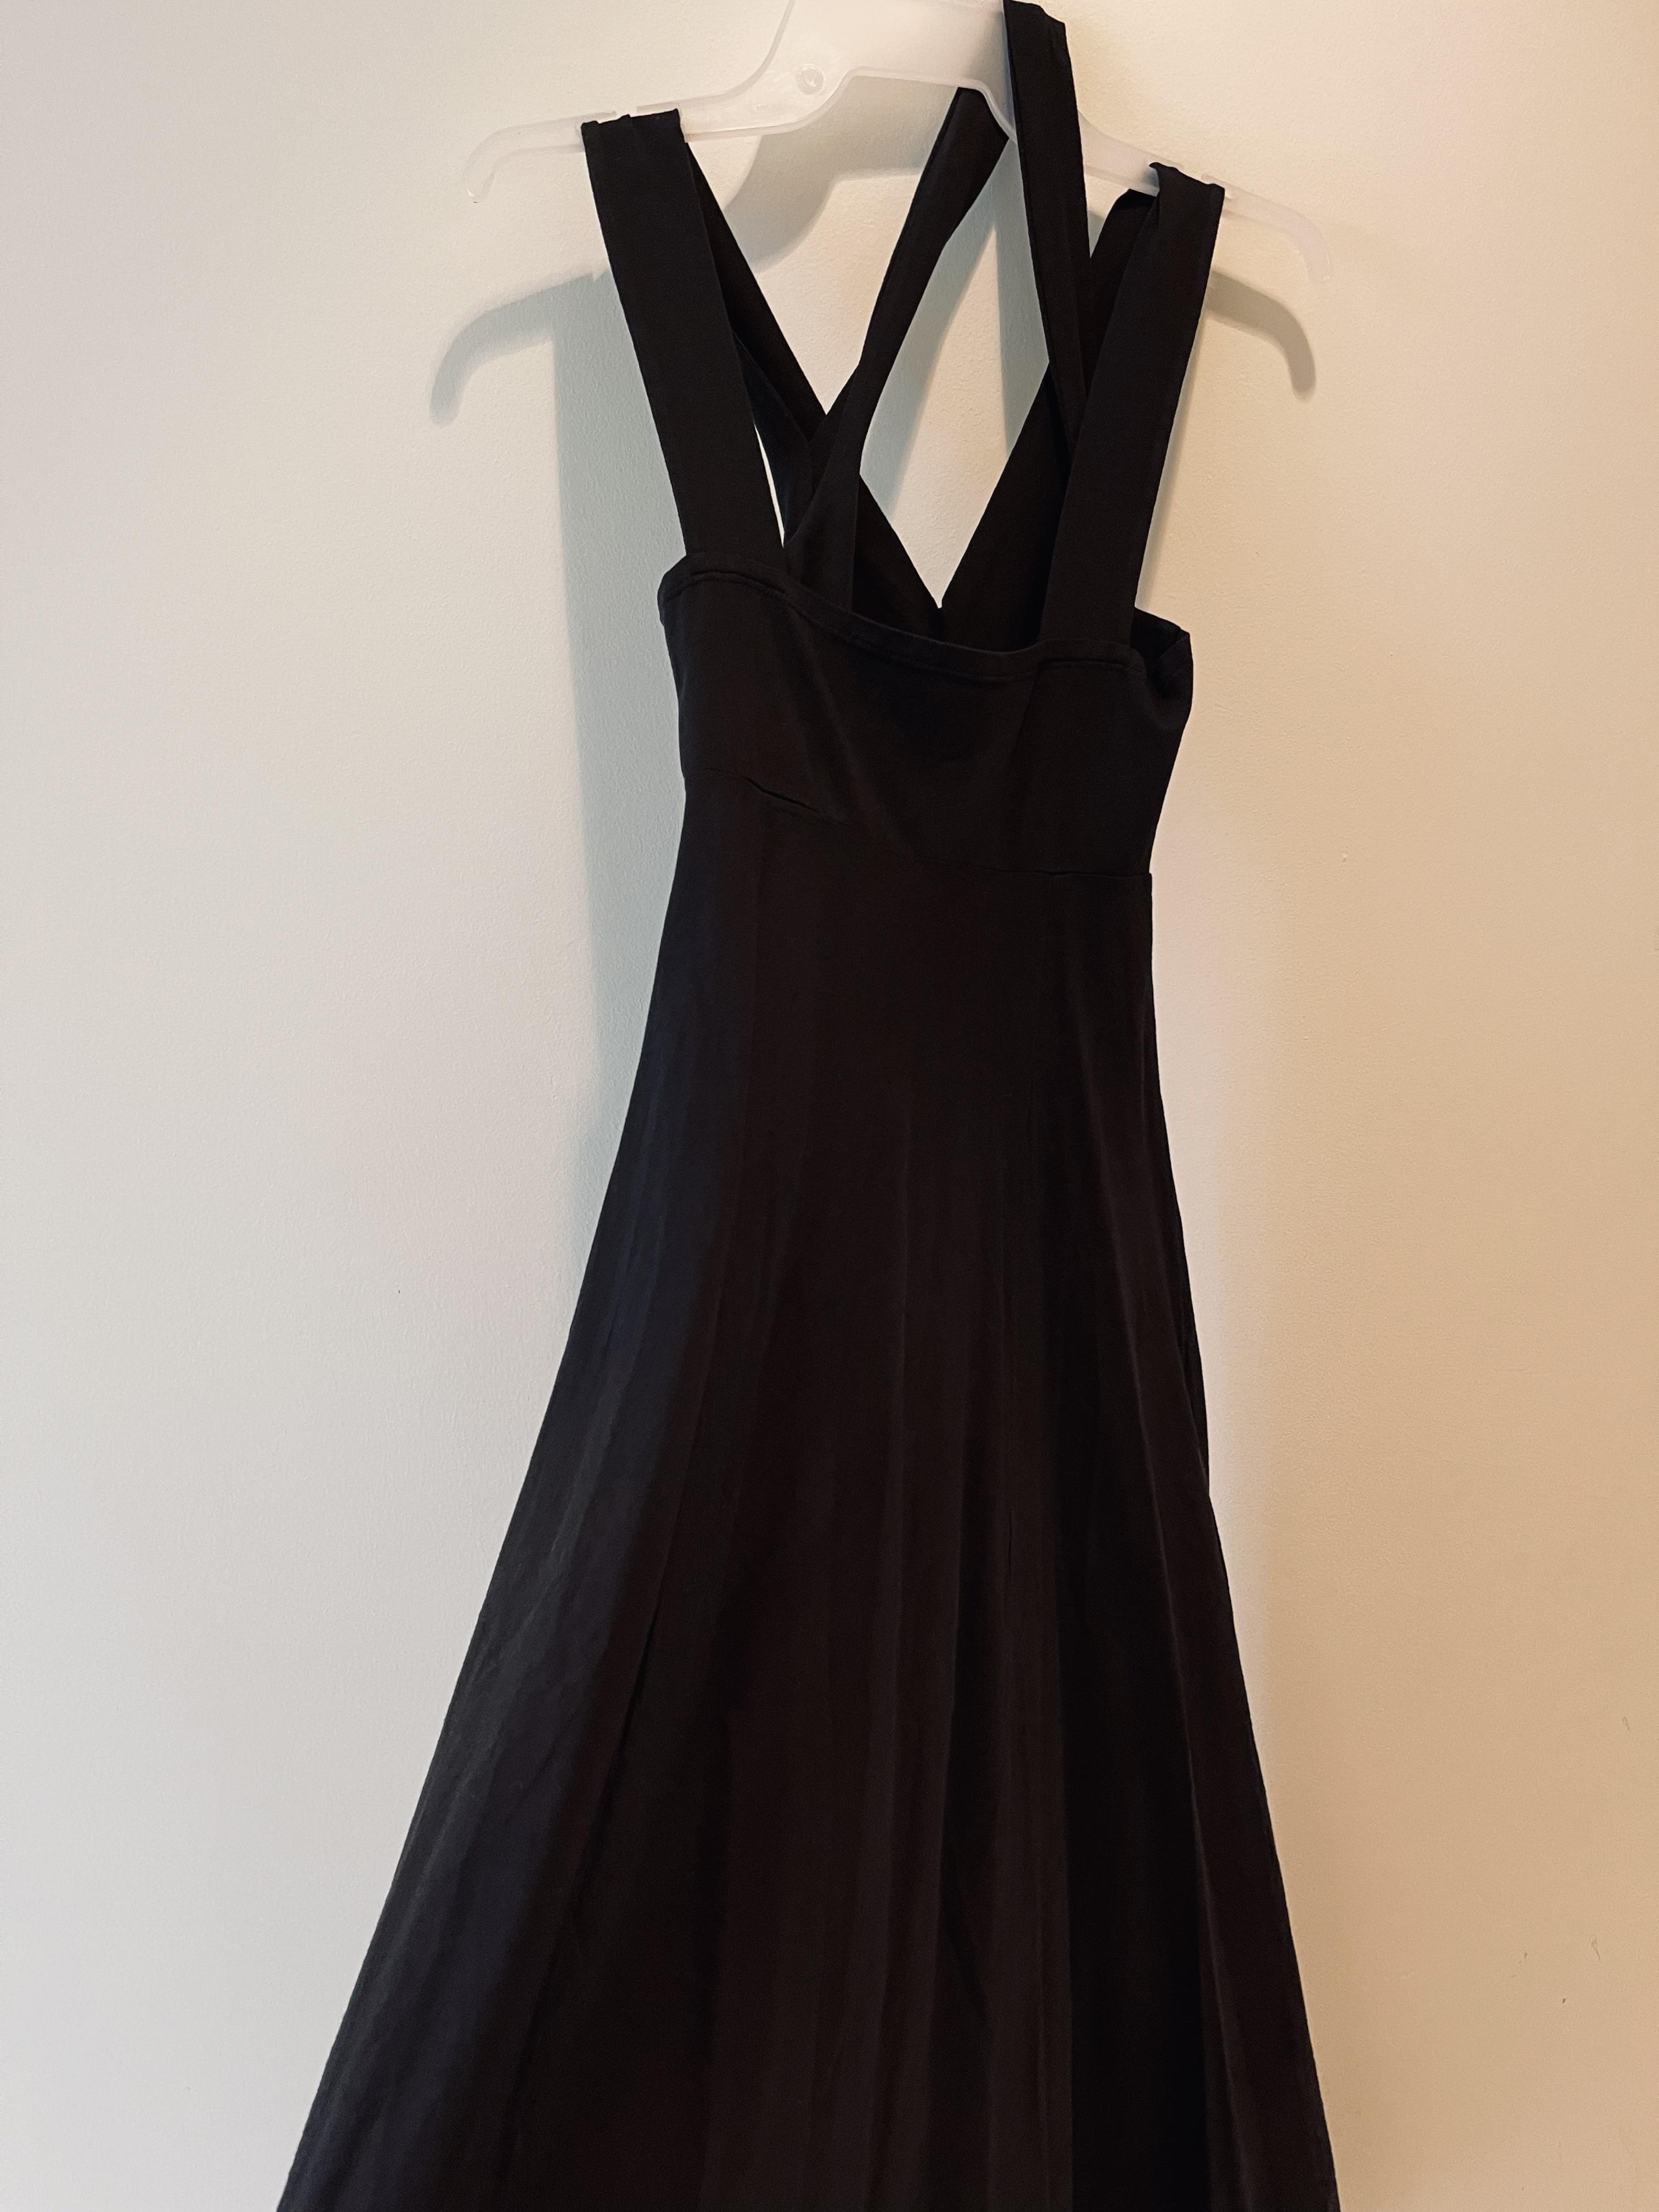 Luna Luz: Diamond Neck Cotton Muslin Dress (Ships Immed in Black, 2 Left!)